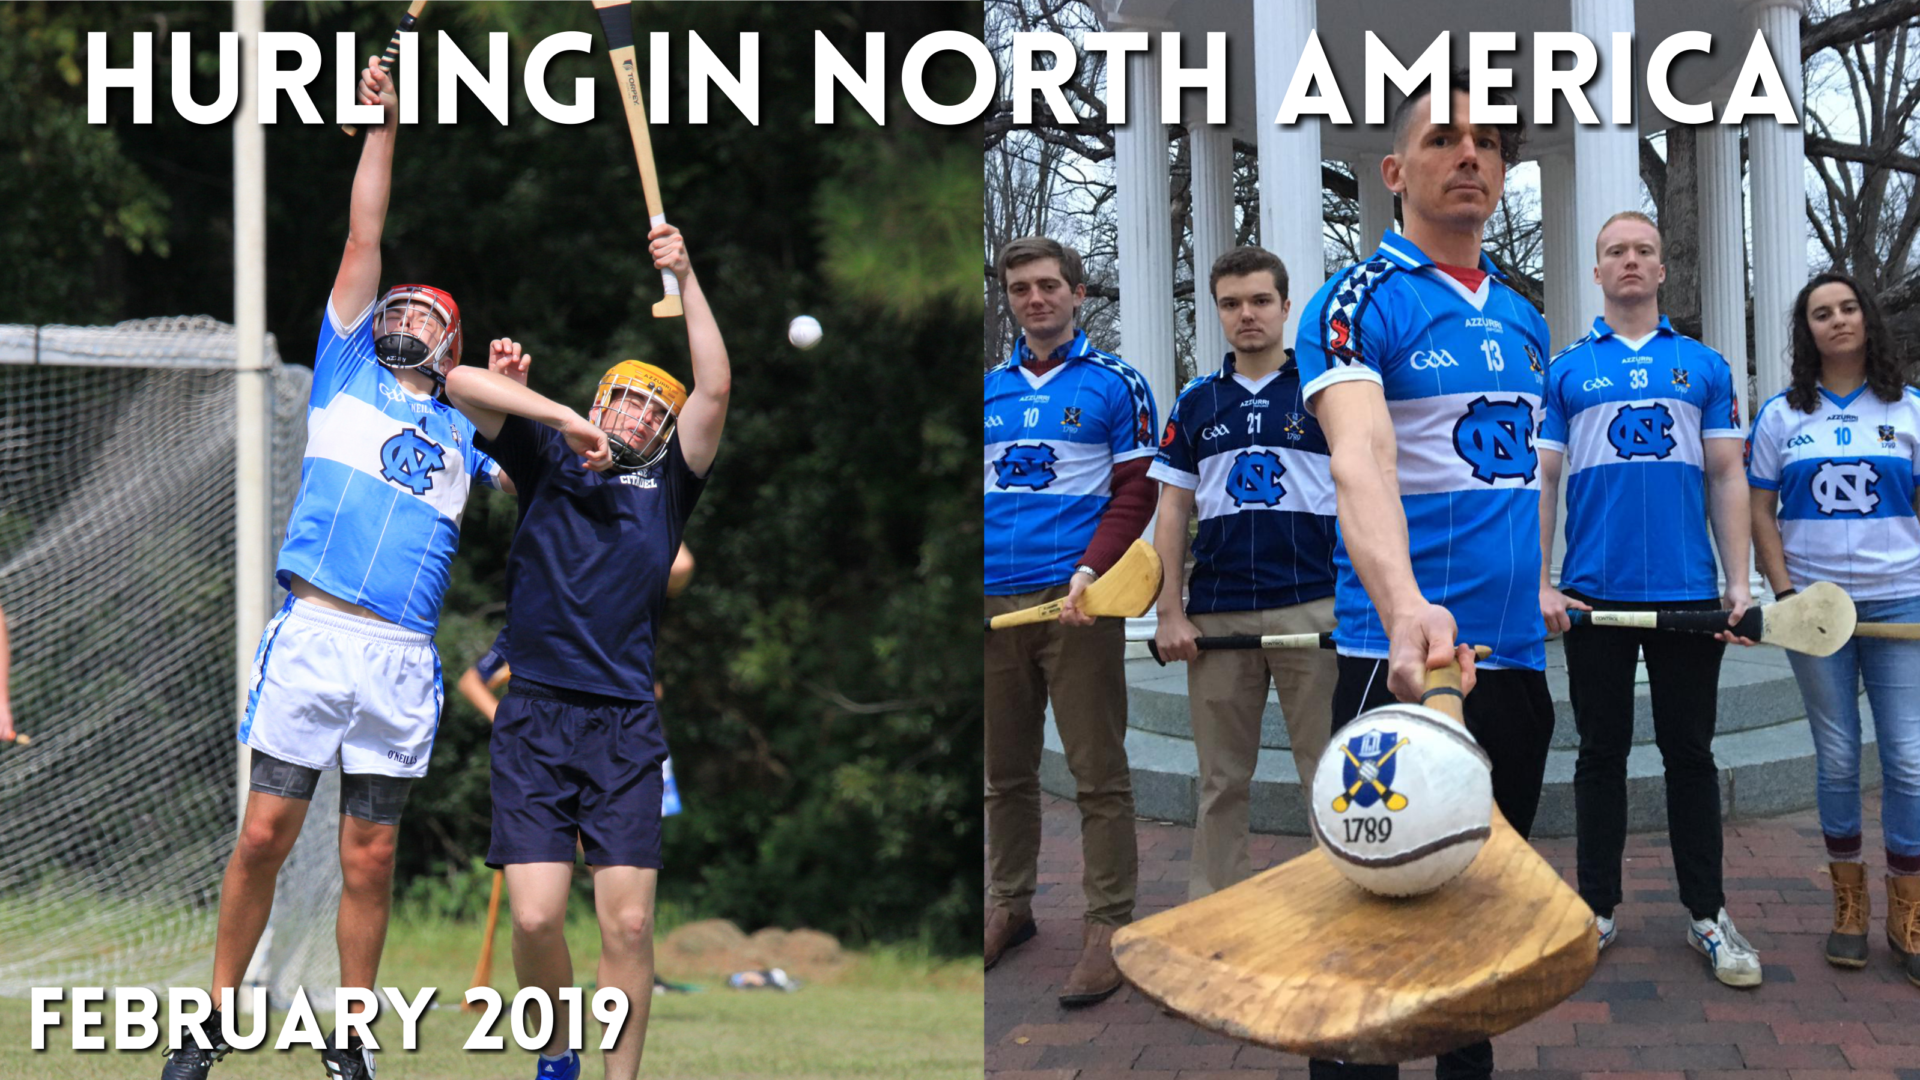 Hurling in North America News | February 2019